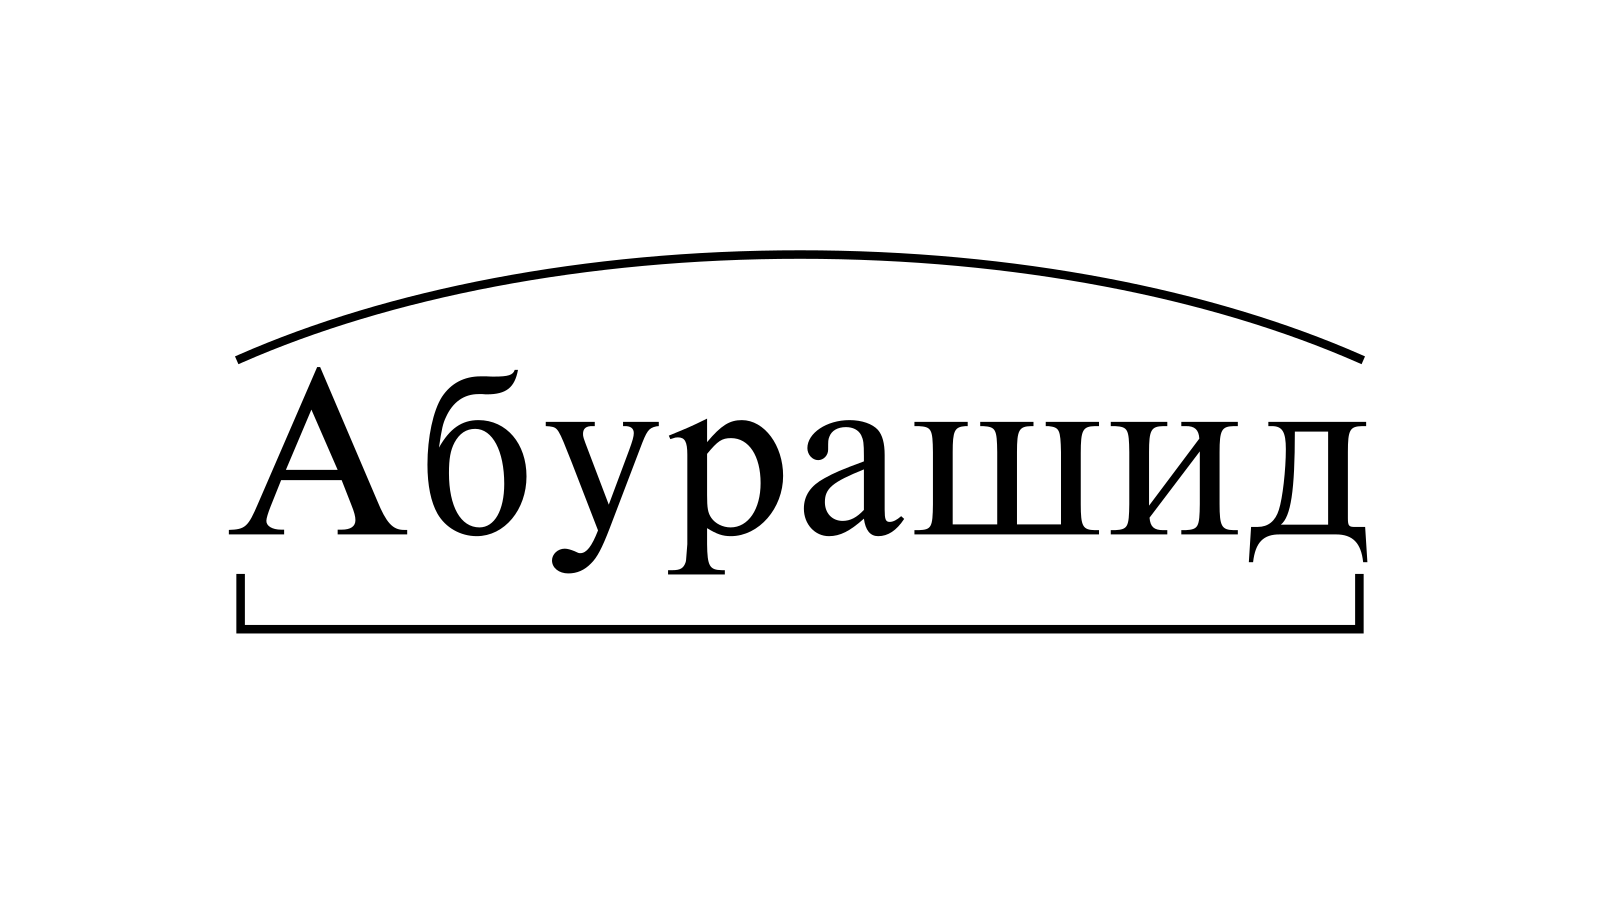 Разбор слова «Абурашид» по составу